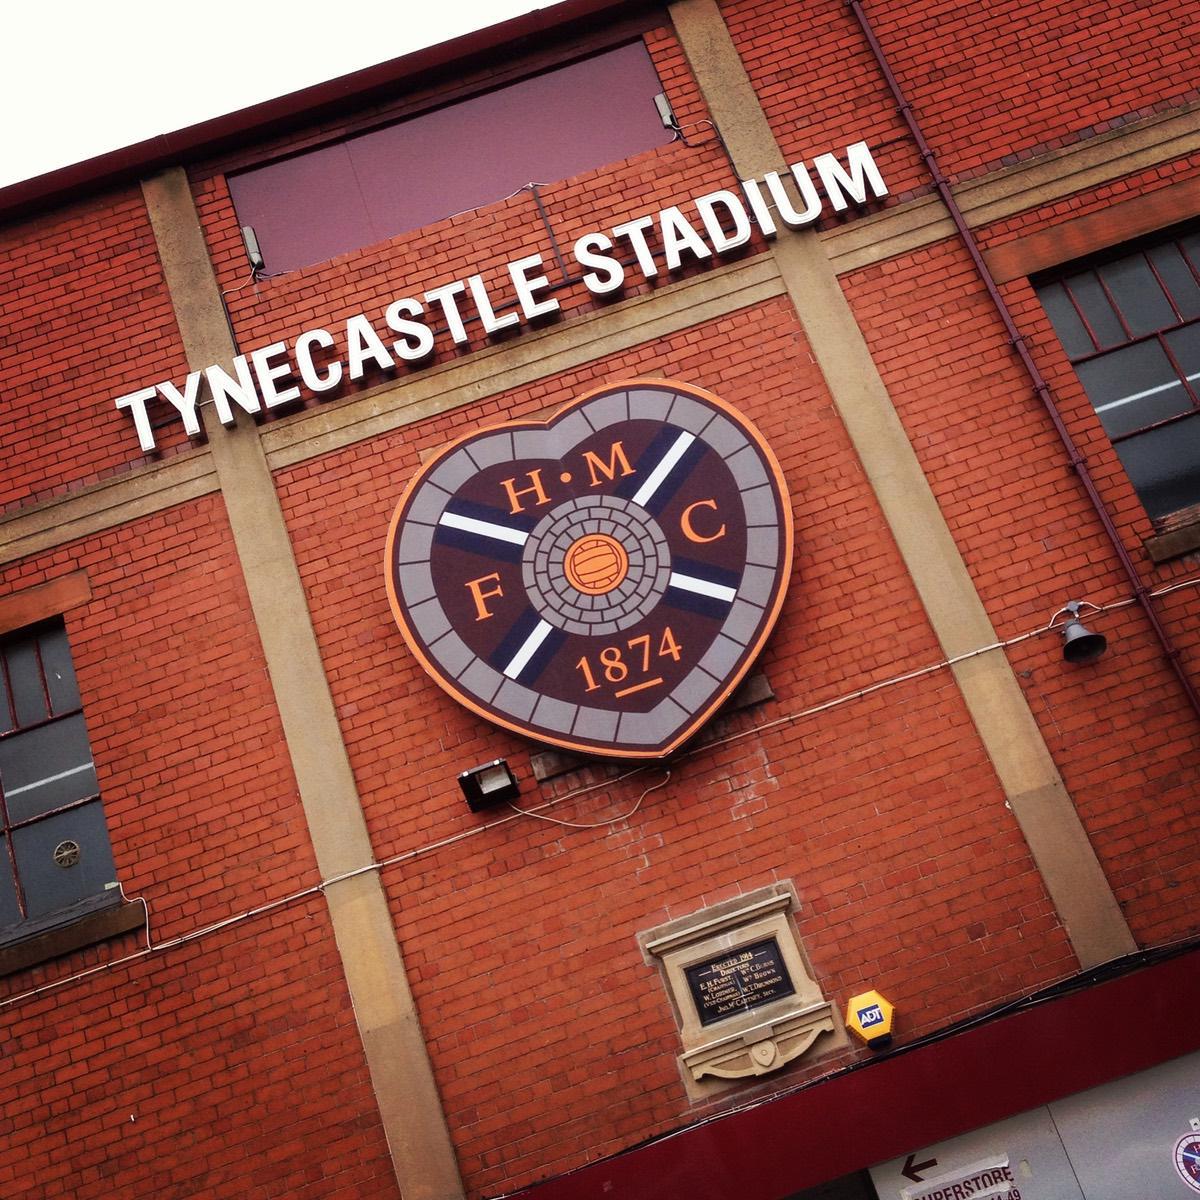 Tynecastle-Stadium, Heart of Midlothian, Edinburgh